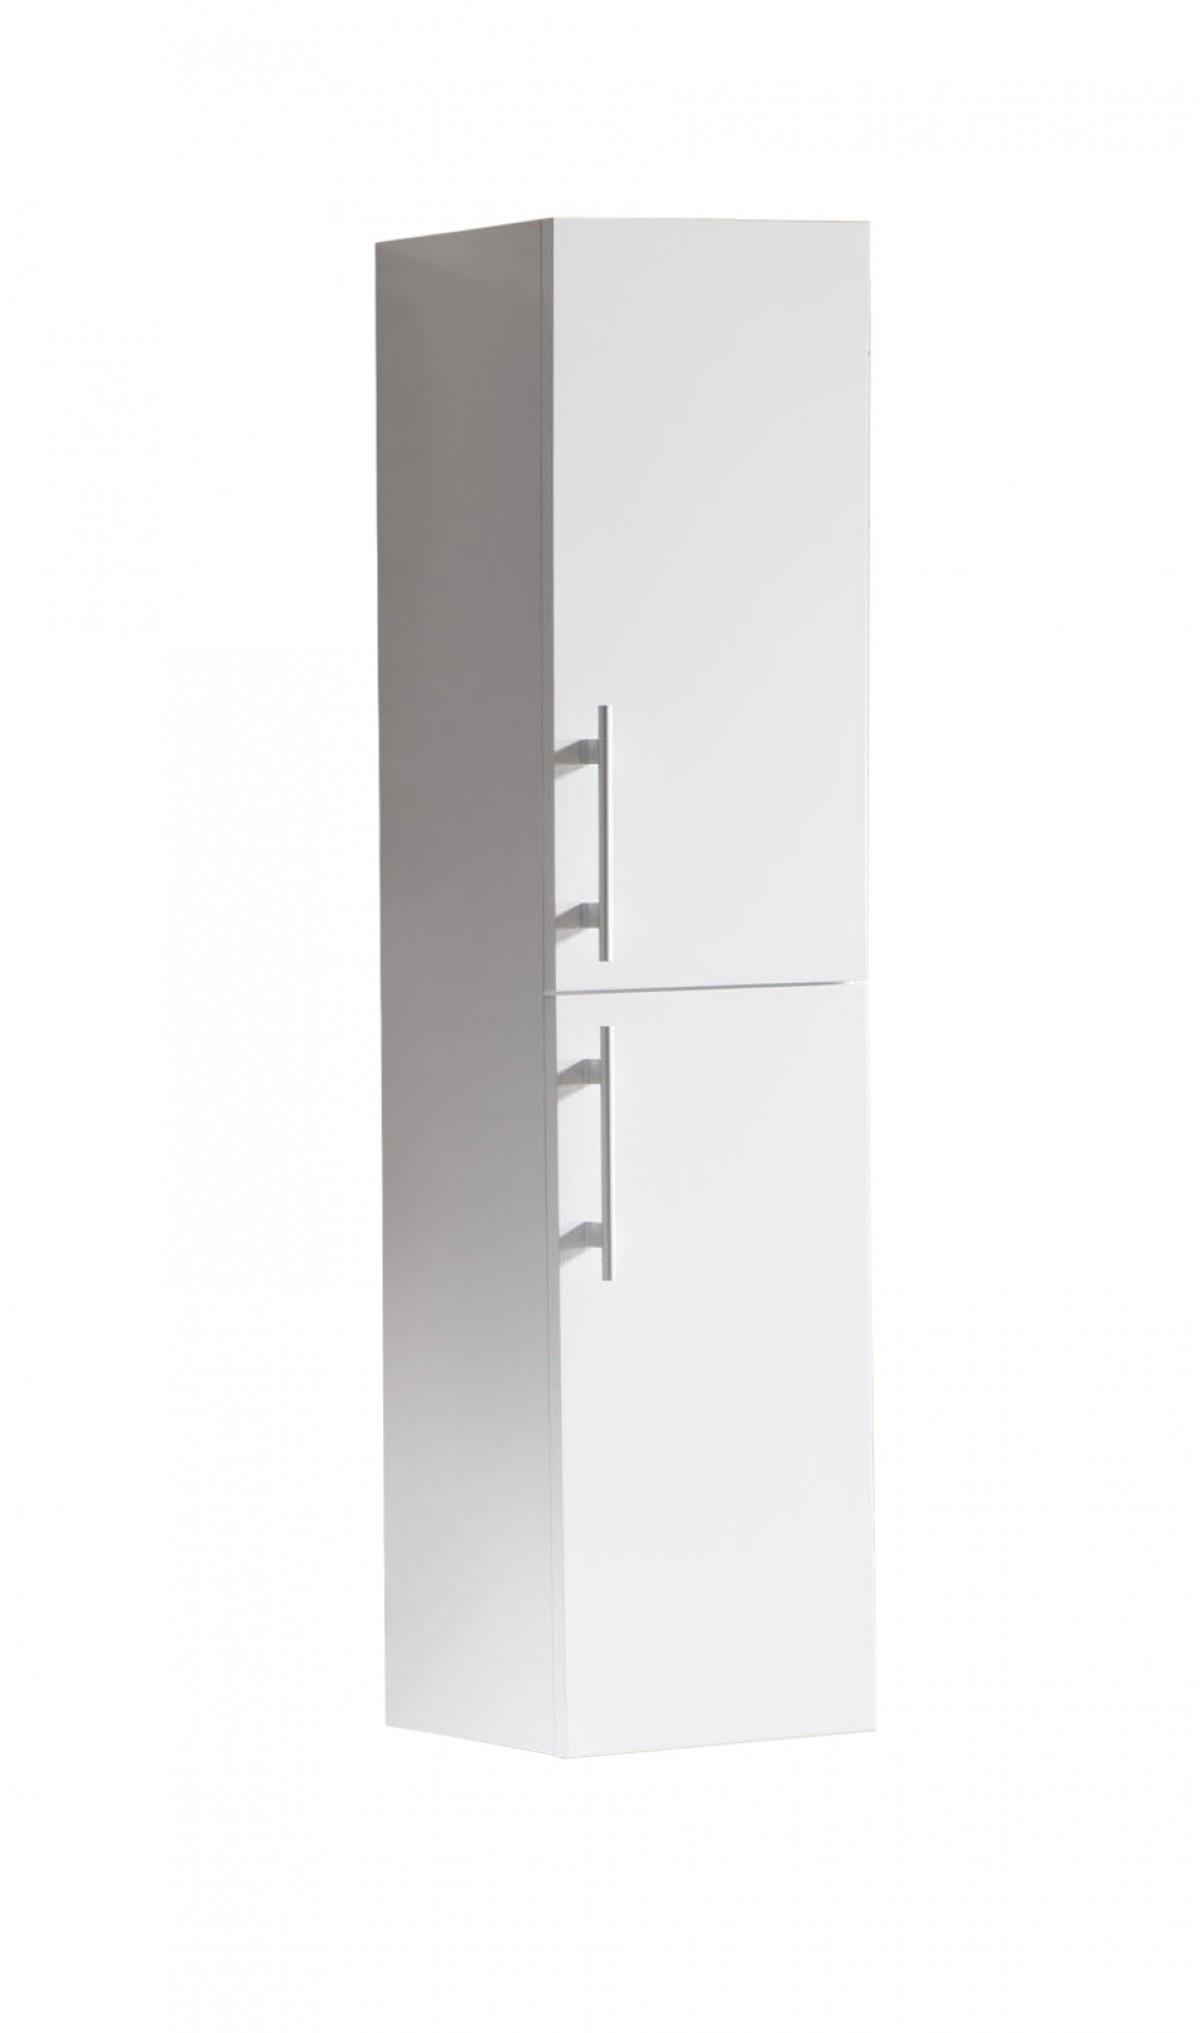 SaniGoods Giant kolomkast 120x30cm hoogglans wit